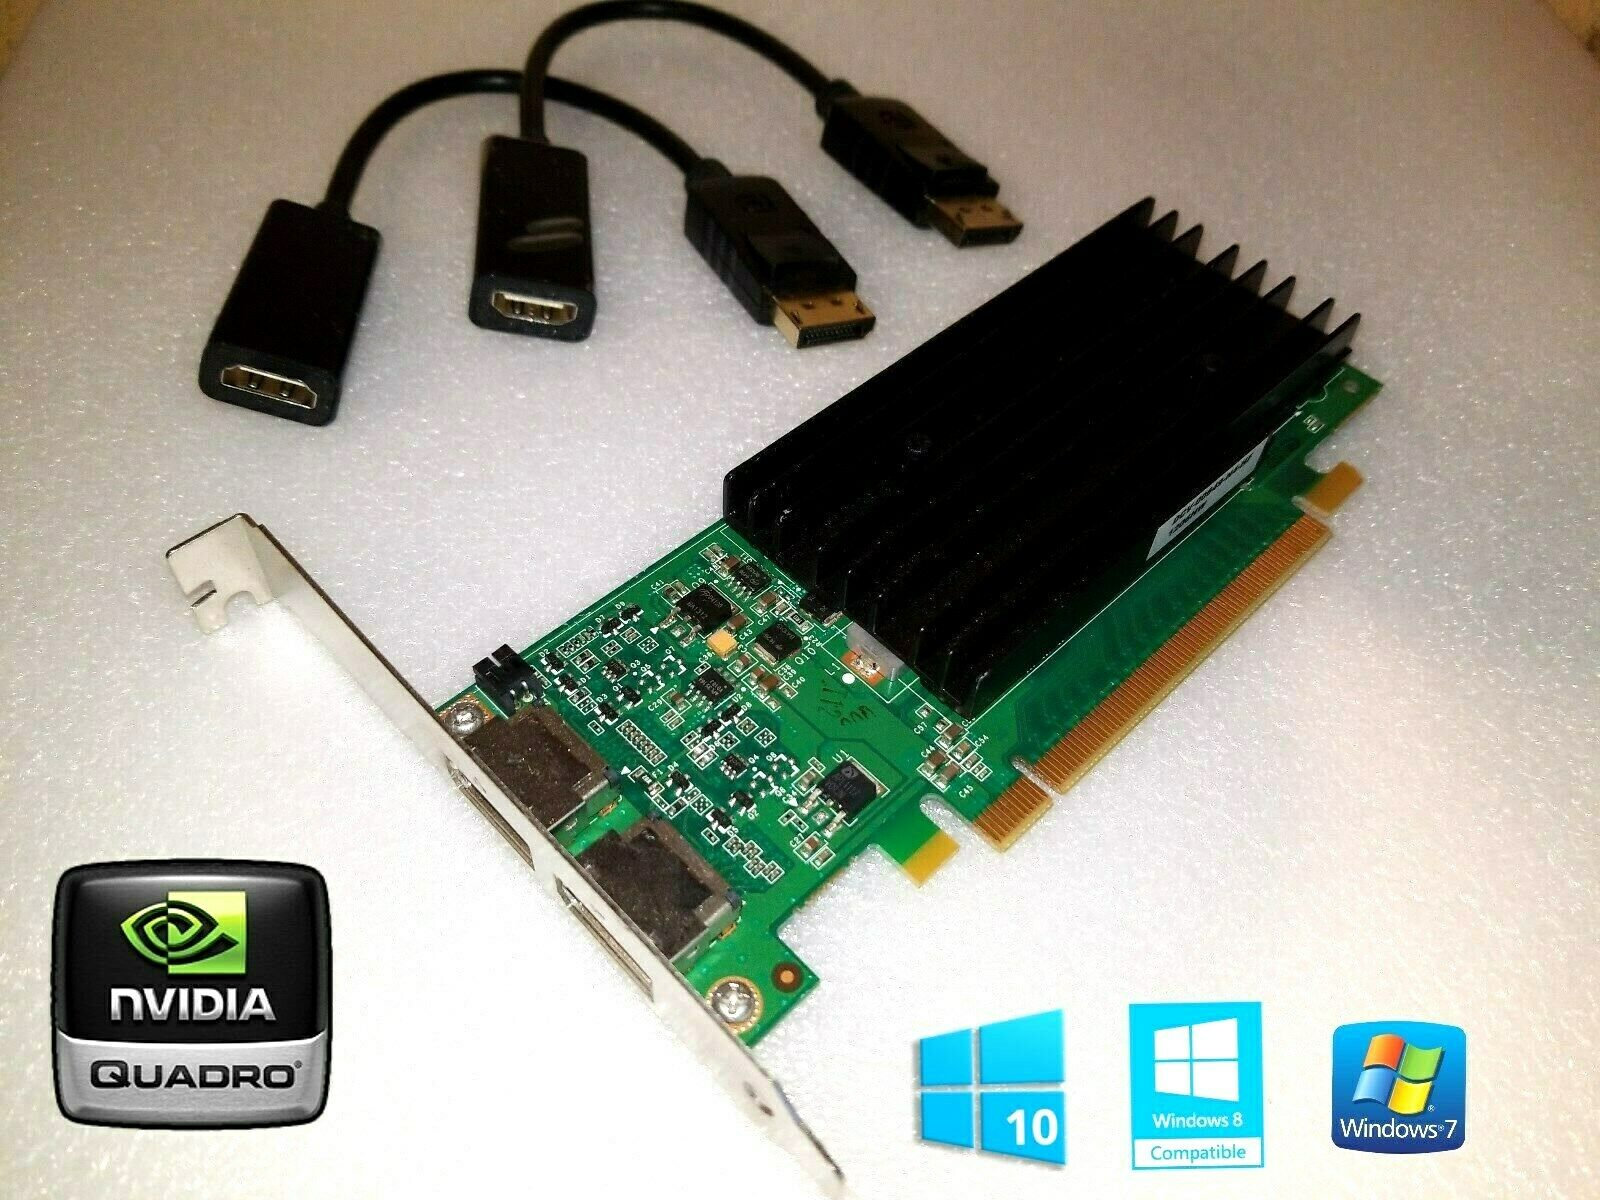 HP Compaq 8200 8300 Elite NVIDIA Tower Dual HDMI Video Card w/ 2 HDMI Adapters